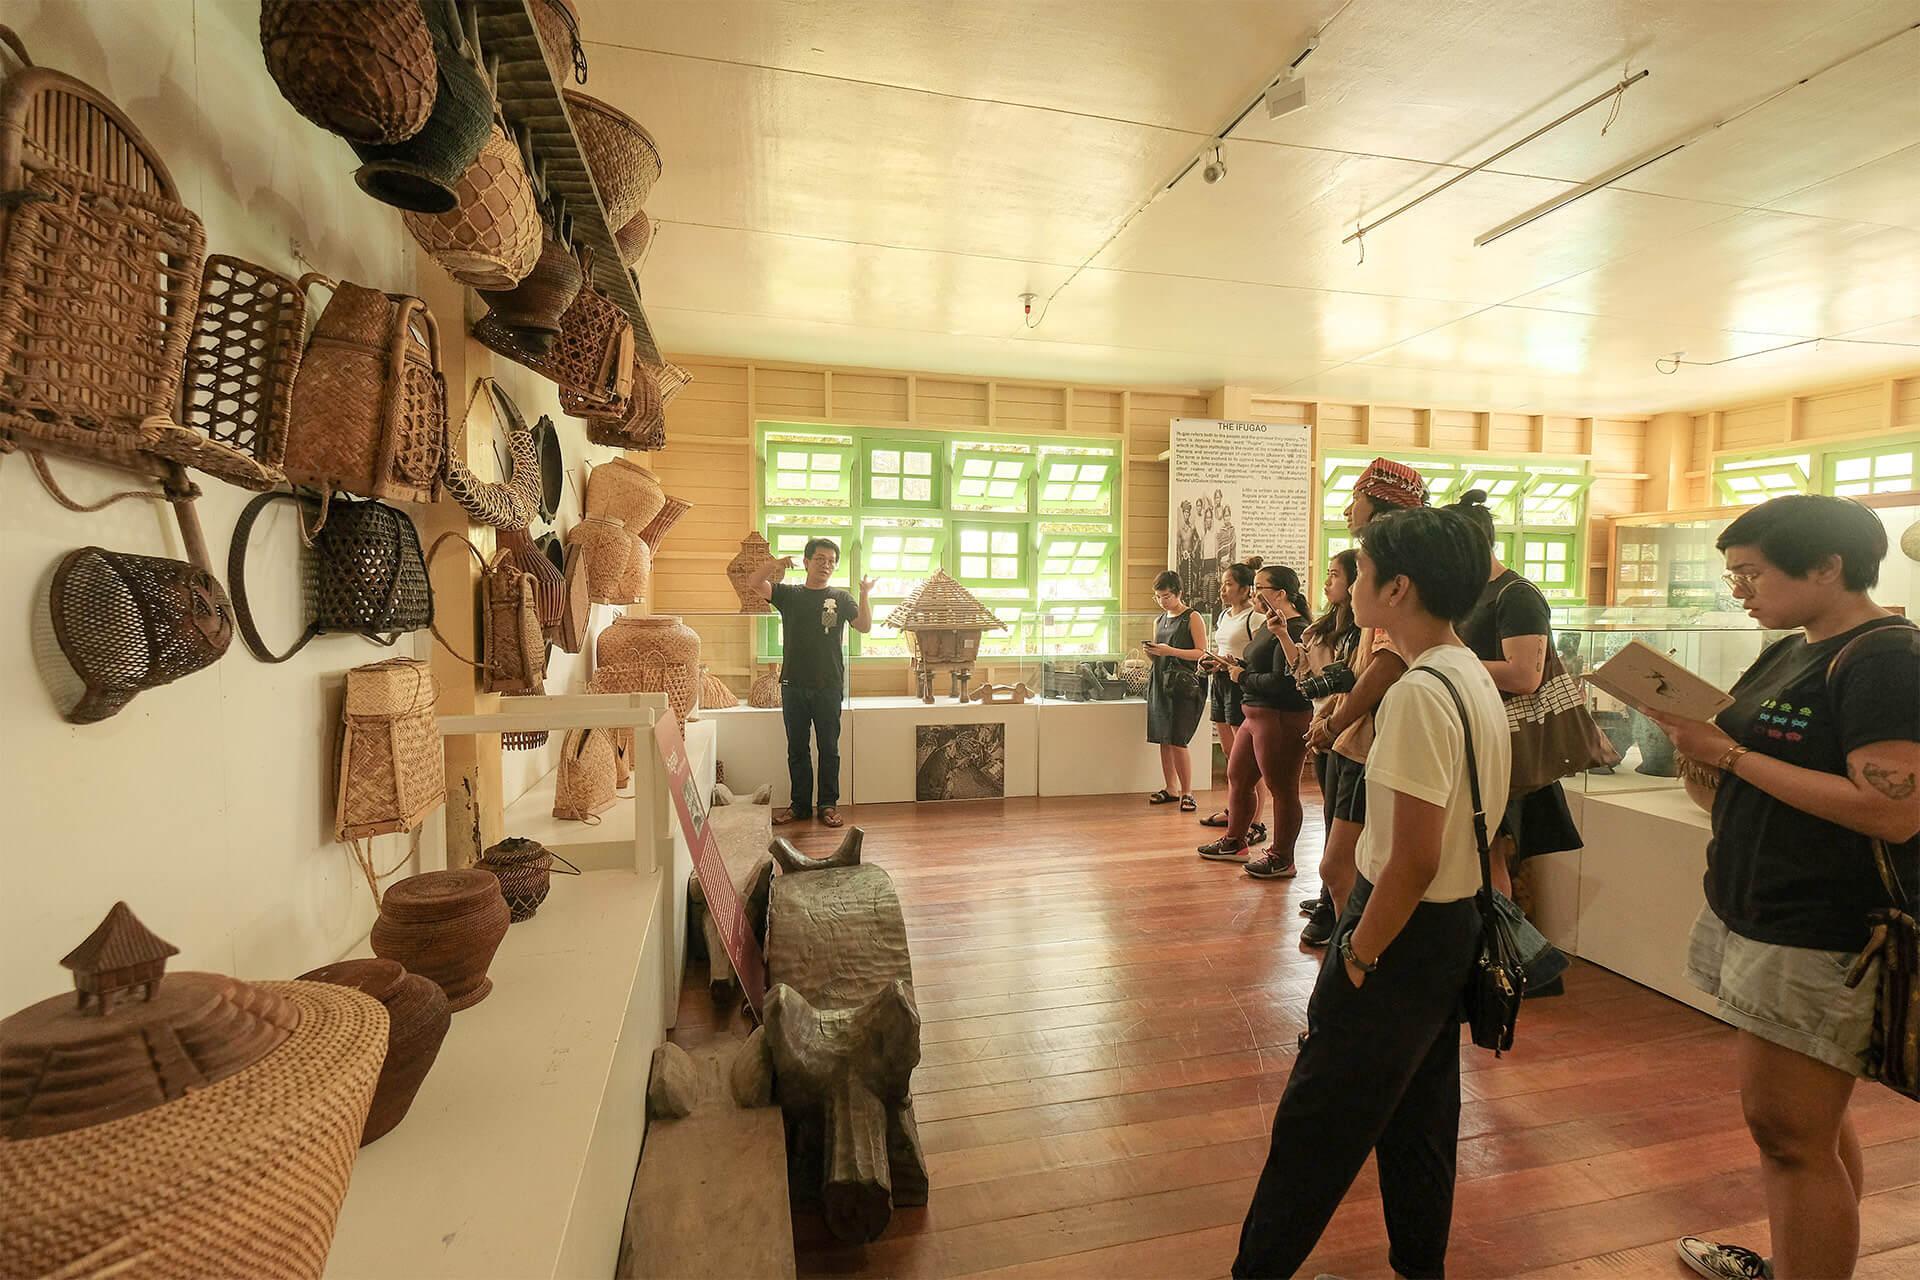 Marlon Martin leads the tour featuring Ifugao woven baskets